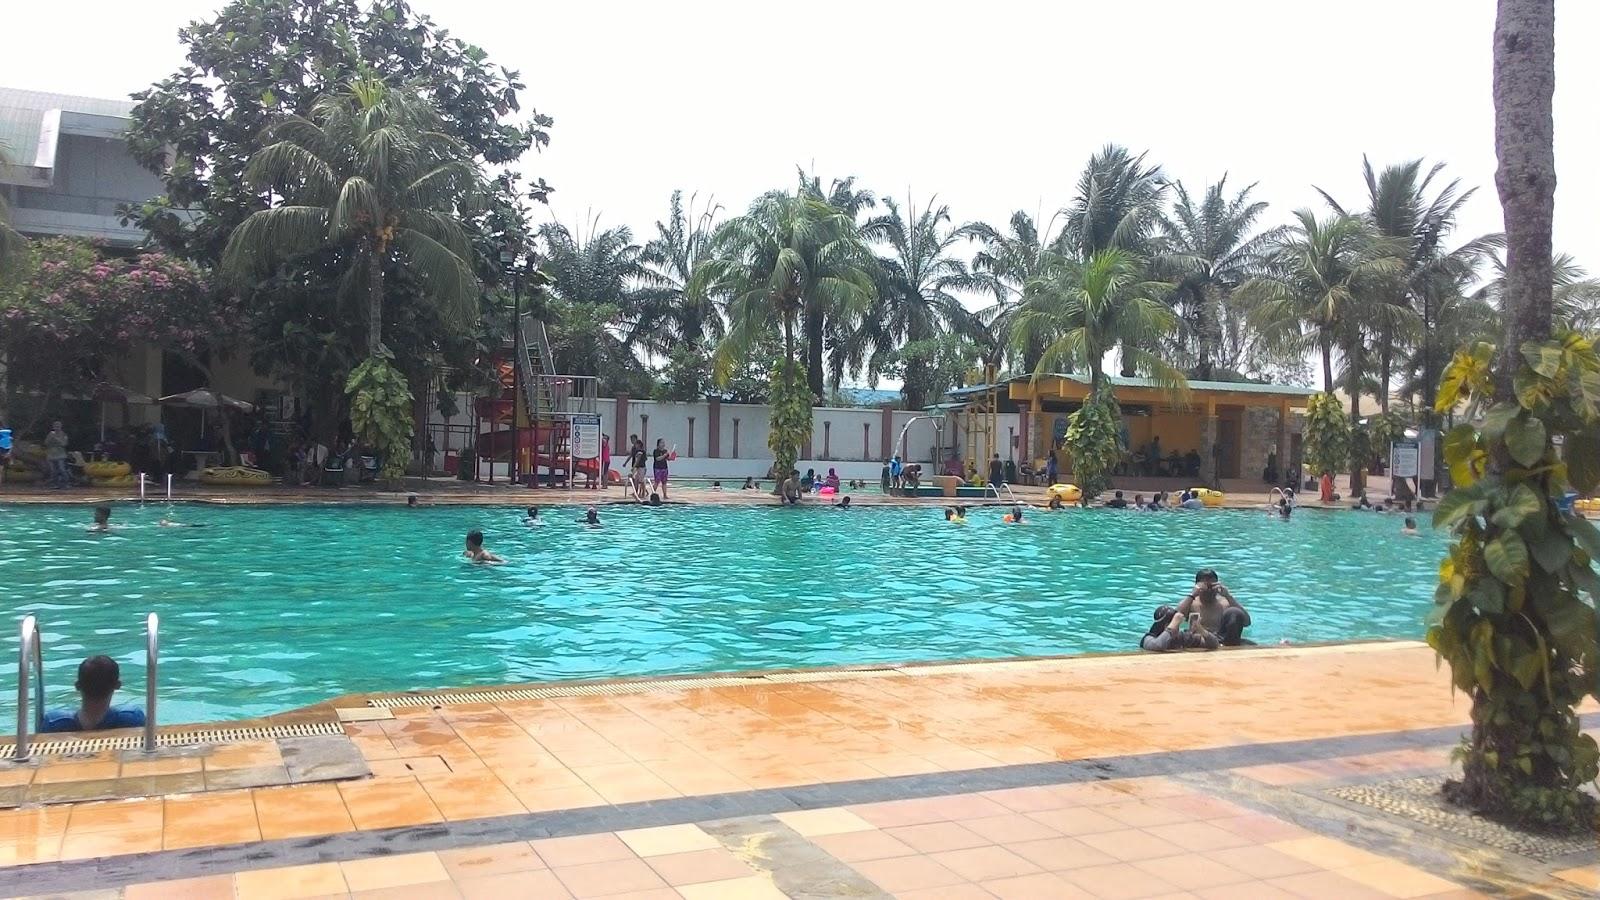 Review Wisata Citra Raya Water World Kolam Renang Olympic Belajar